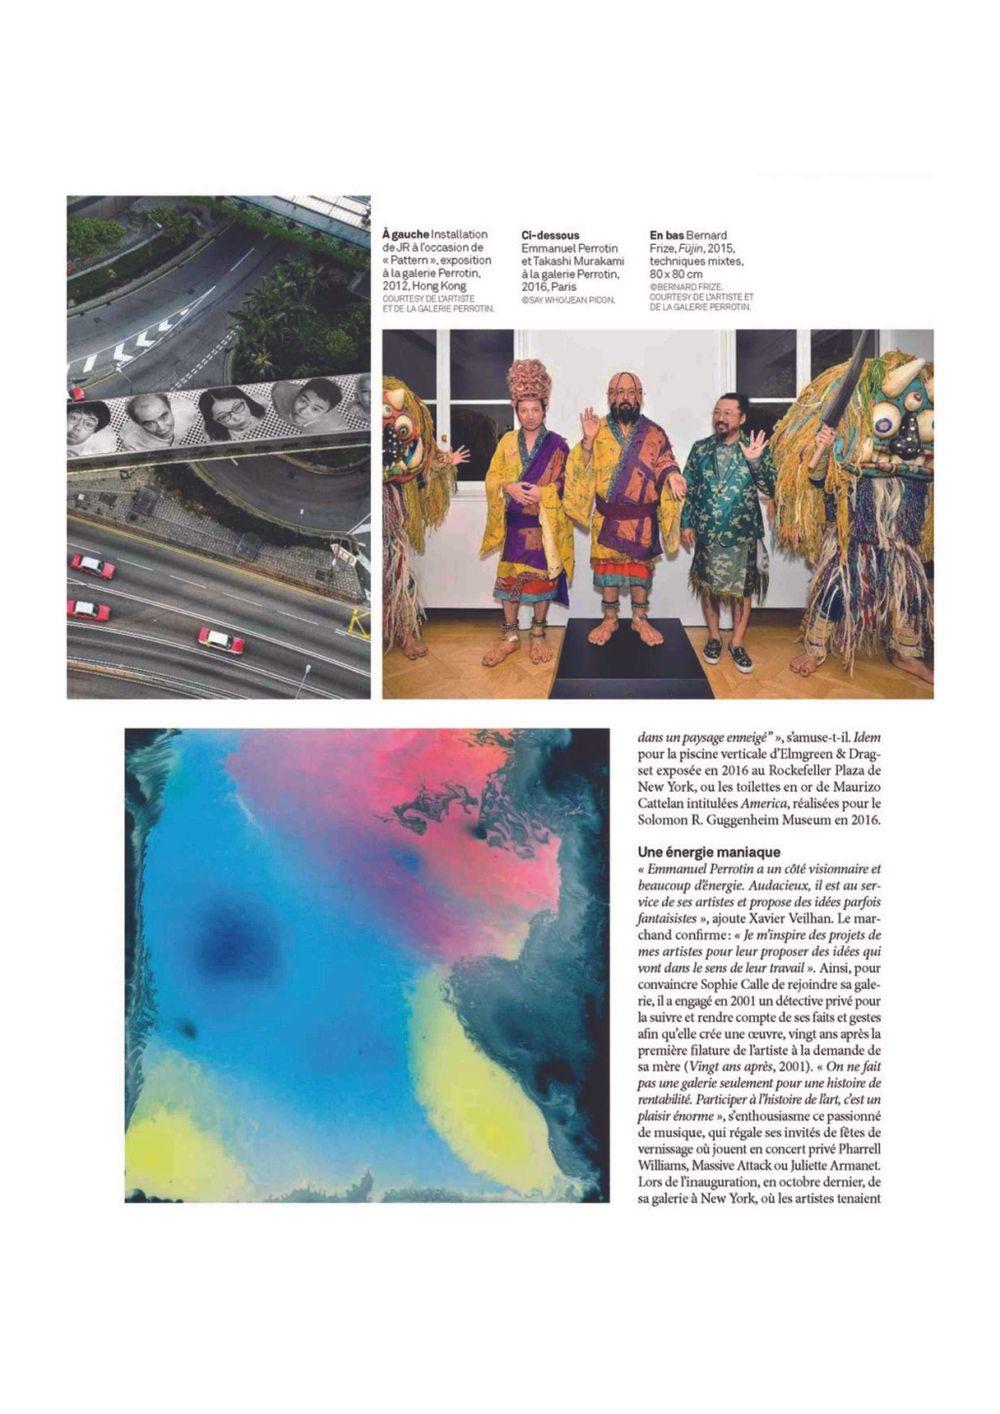 Connaissance des Arts | ELMGREEN & DRAGSET